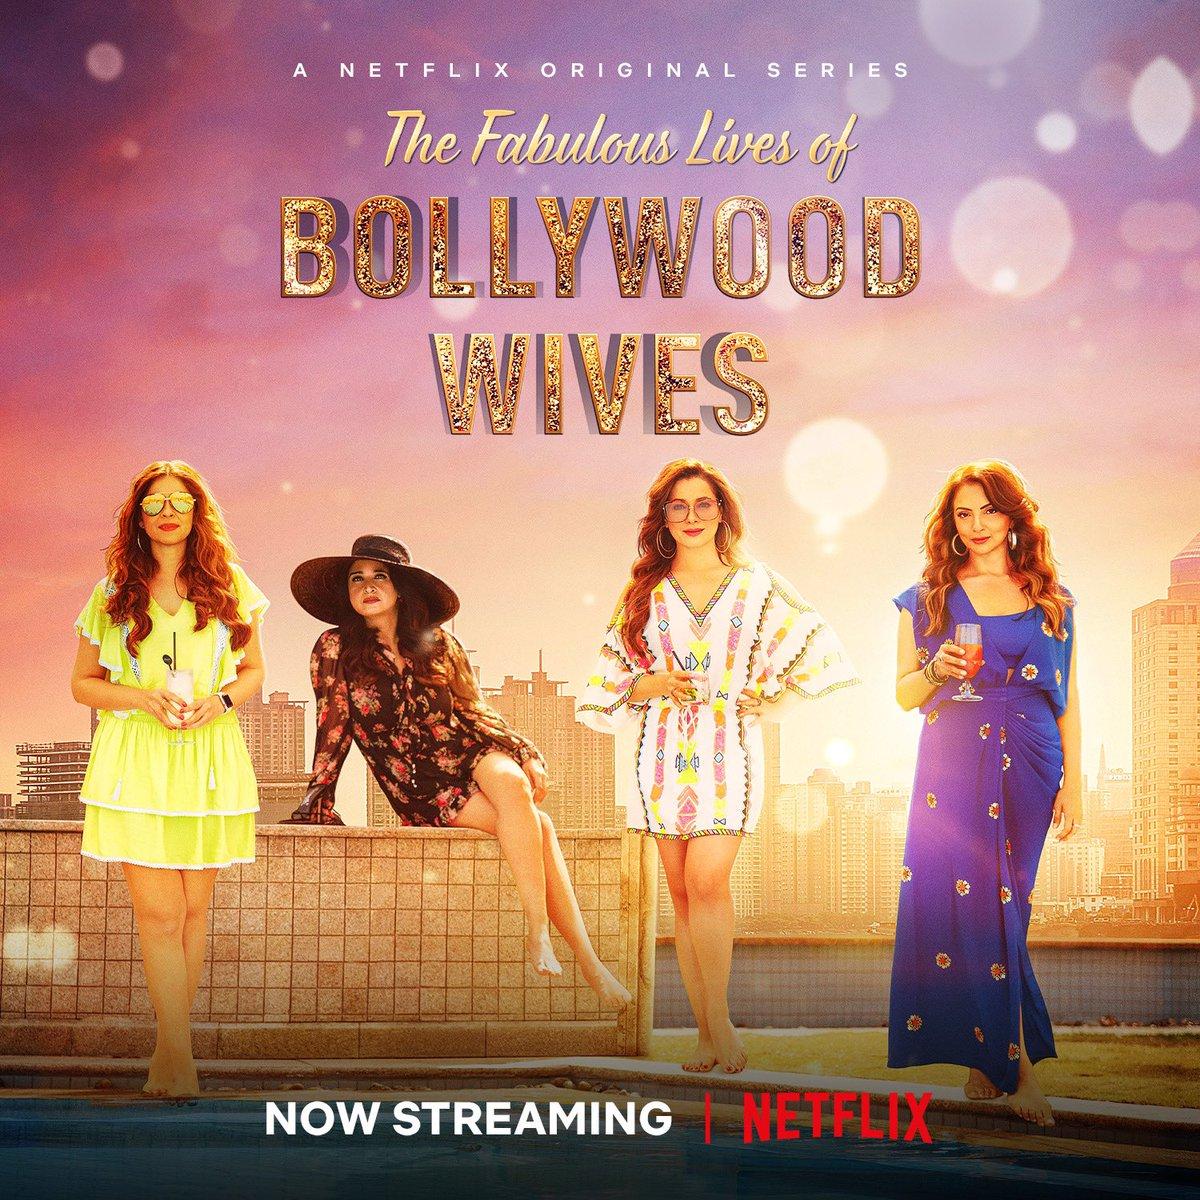 #FabulousLives of Bollywood Wives, now streaming on @NetflixIndia  @maheepkapoor @neelamkothari @seemakkhan @bhavanapandey @Dharmatic_ @karanjohar @apoorvamehta18 @aneeshabaig @scrappypants #UttamDomale @nowme_datta @LazyEpicurean @manumaharshi @AnuvabPal @NotSoSnob @DharmaMovies